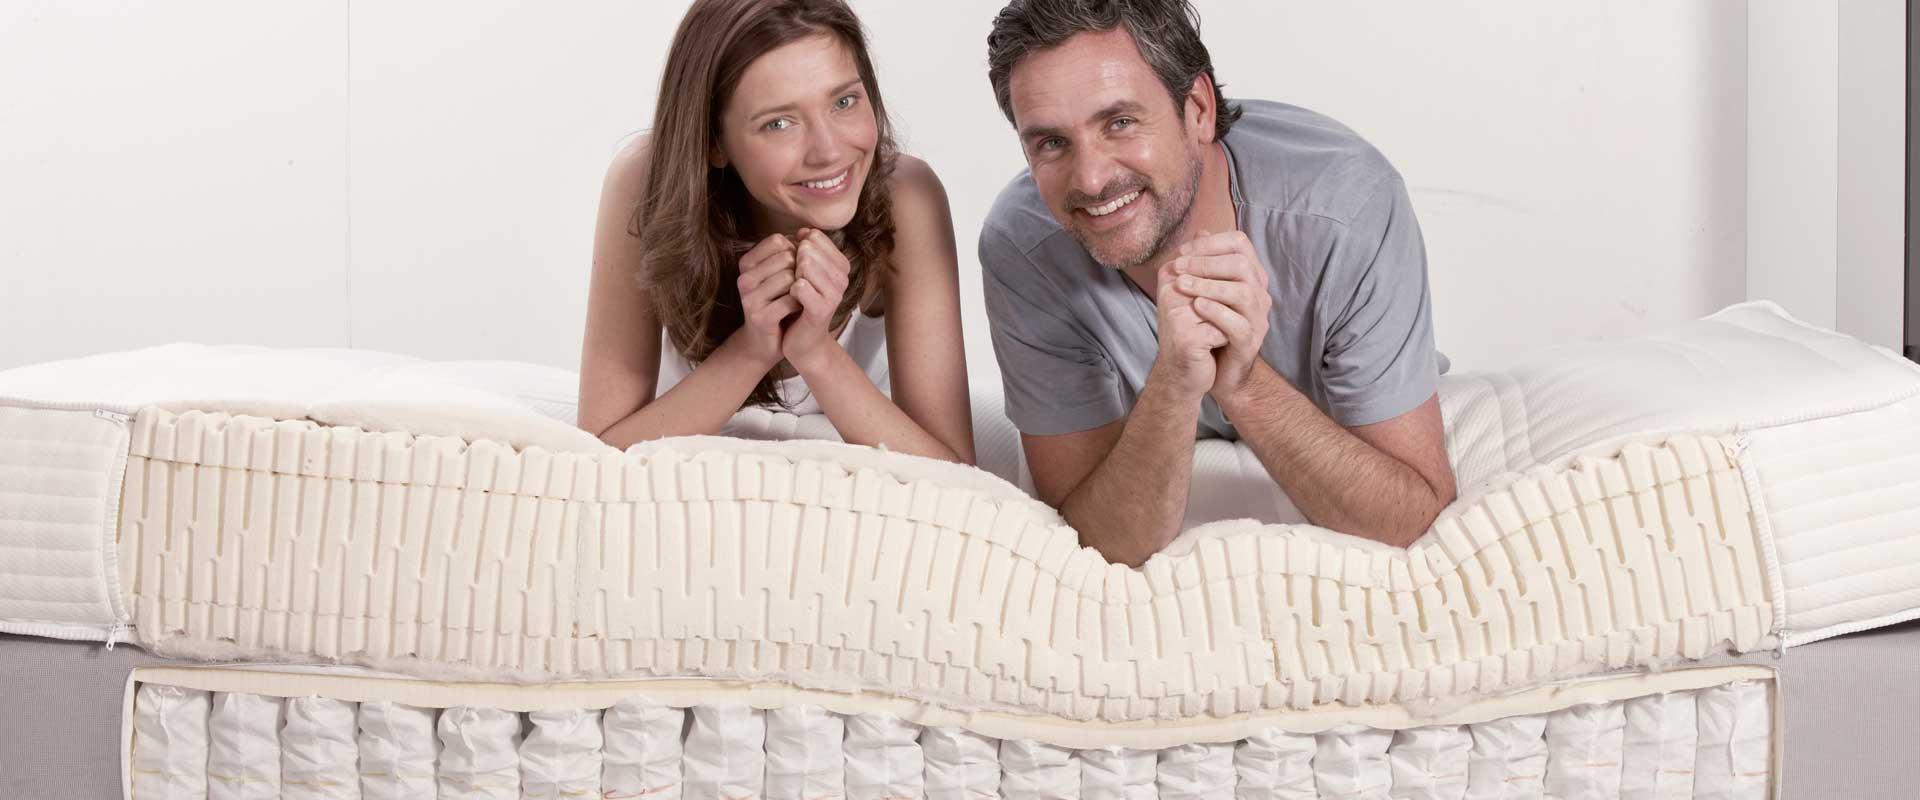 betten hoenscheidt duesseldorf matratzen ergonomie betten h nscheidt. Black Bedroom Furniture Sets. Home Design Ideas